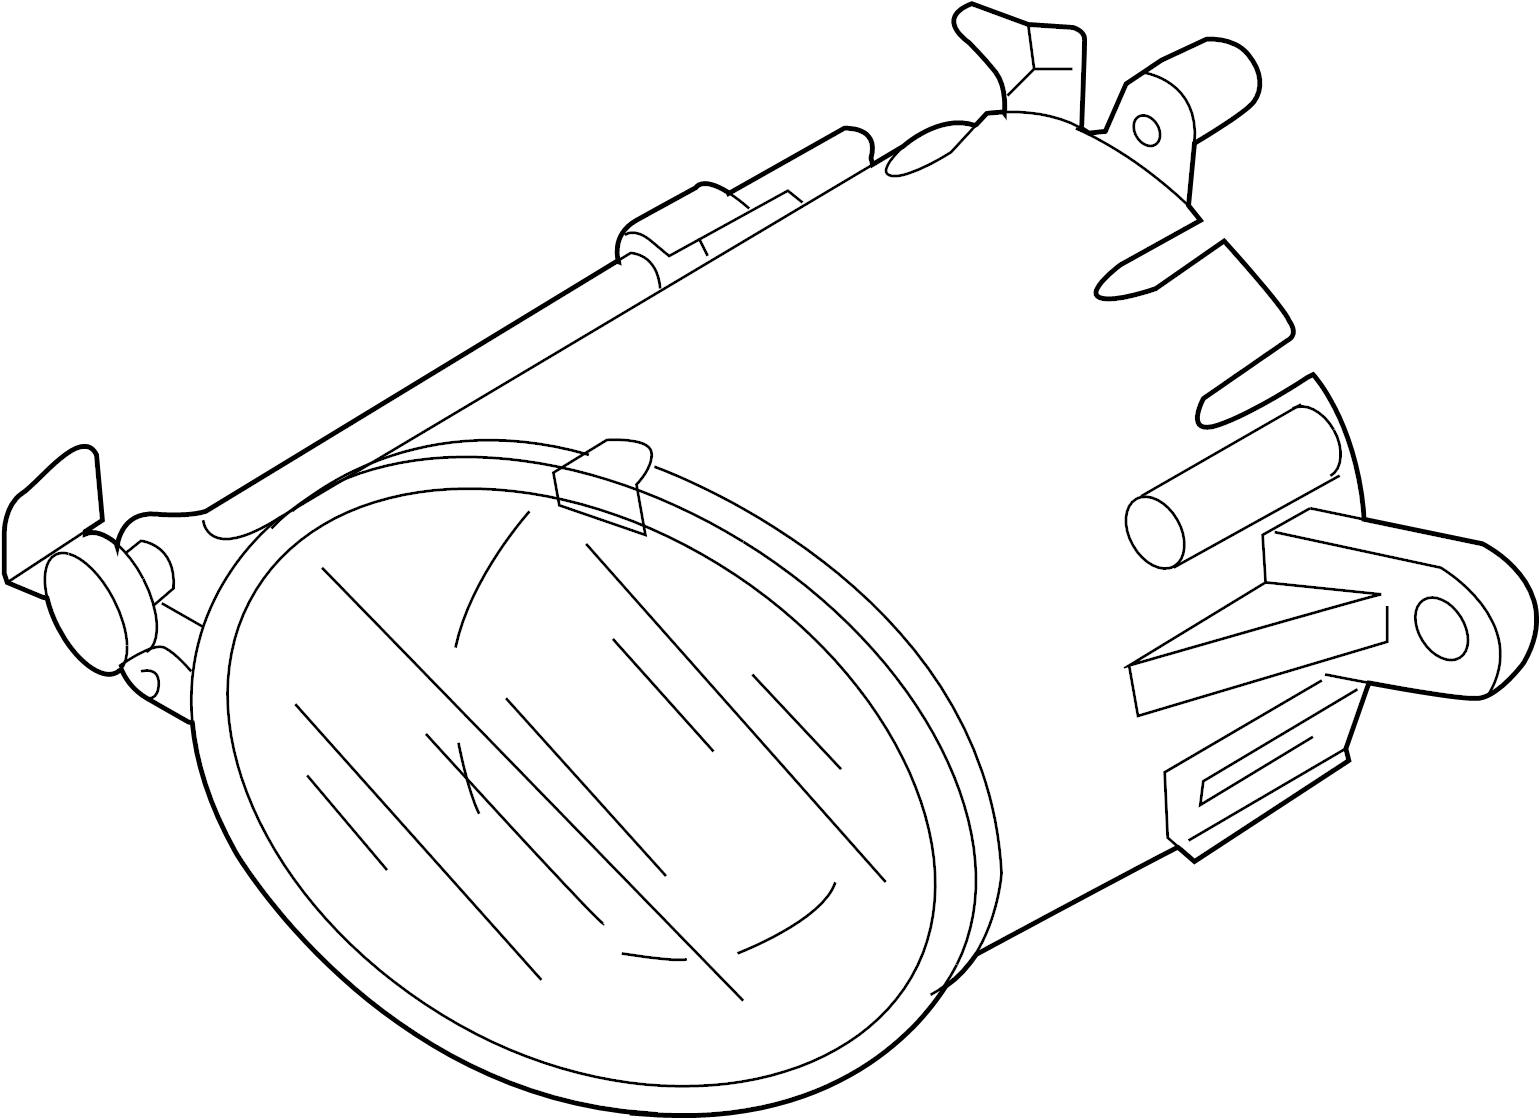 Audi Q7 Halogen Bulb For Low Beam Light Bulb